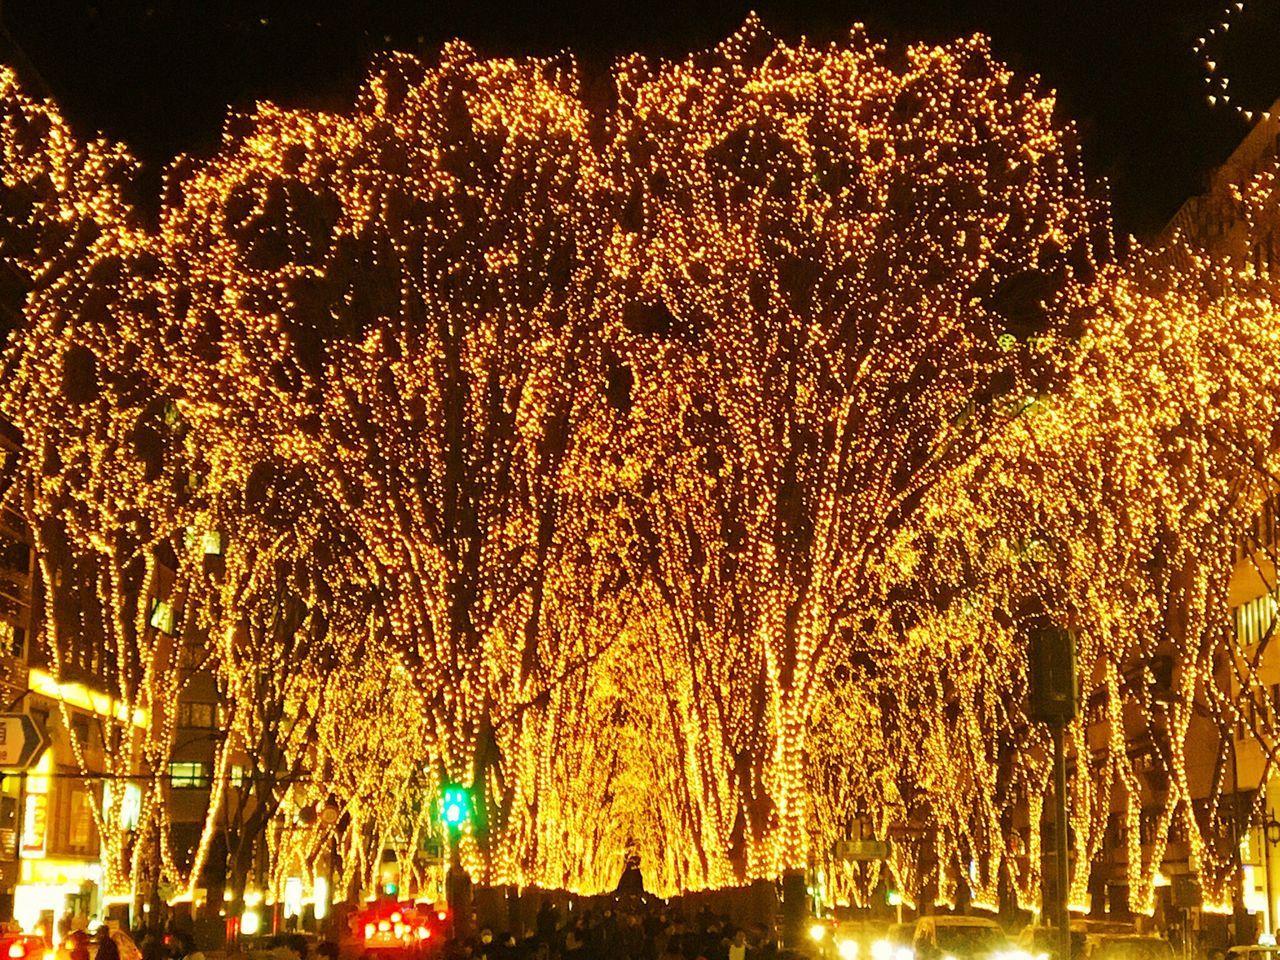 illuminated, night, tree, no people, outdoors, nature, sky, beauty in nature